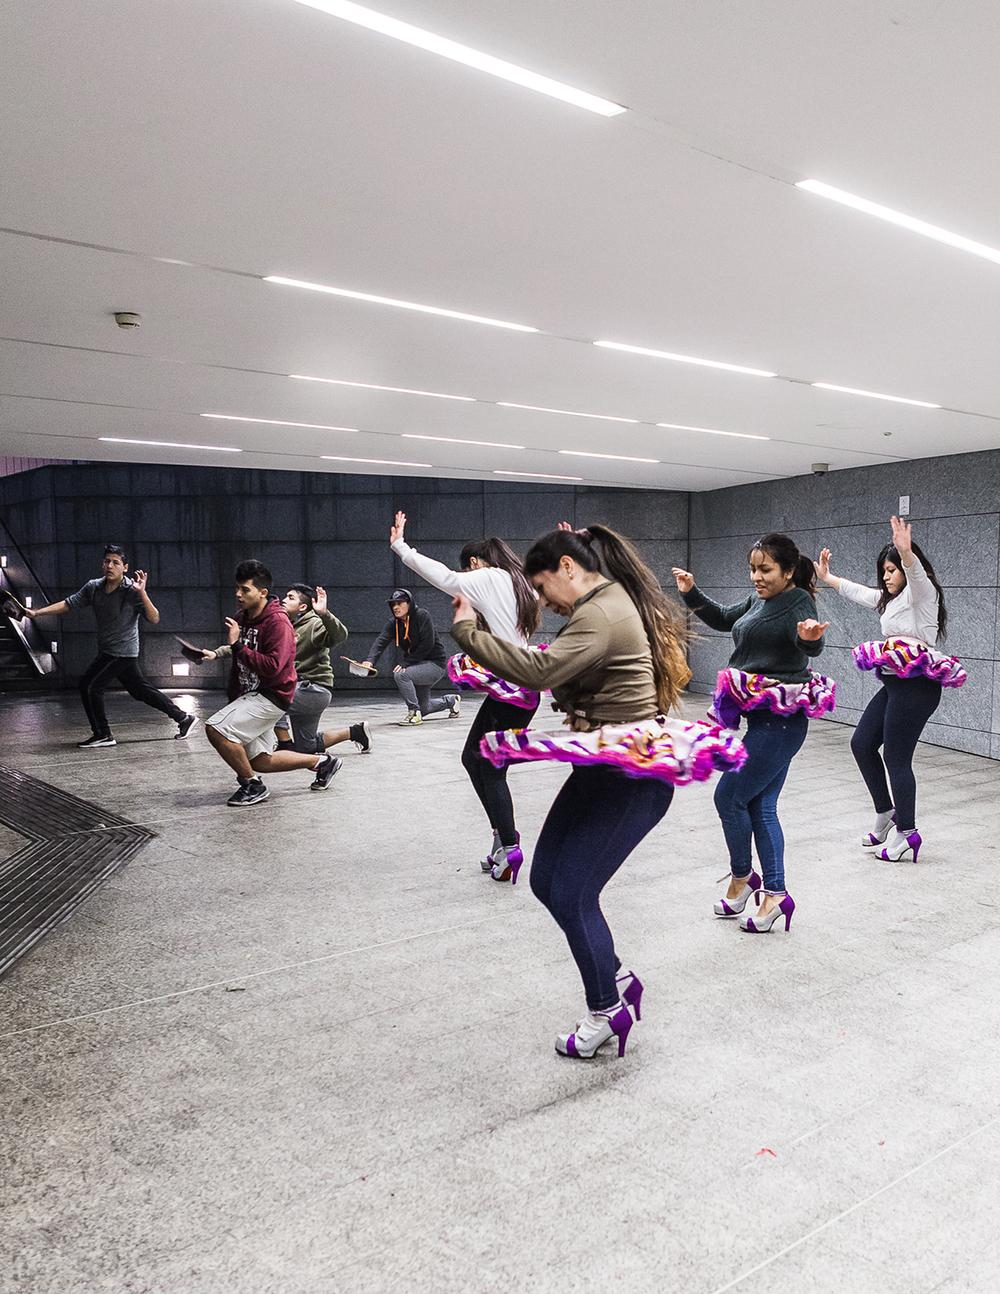 streetdance 07.jpg